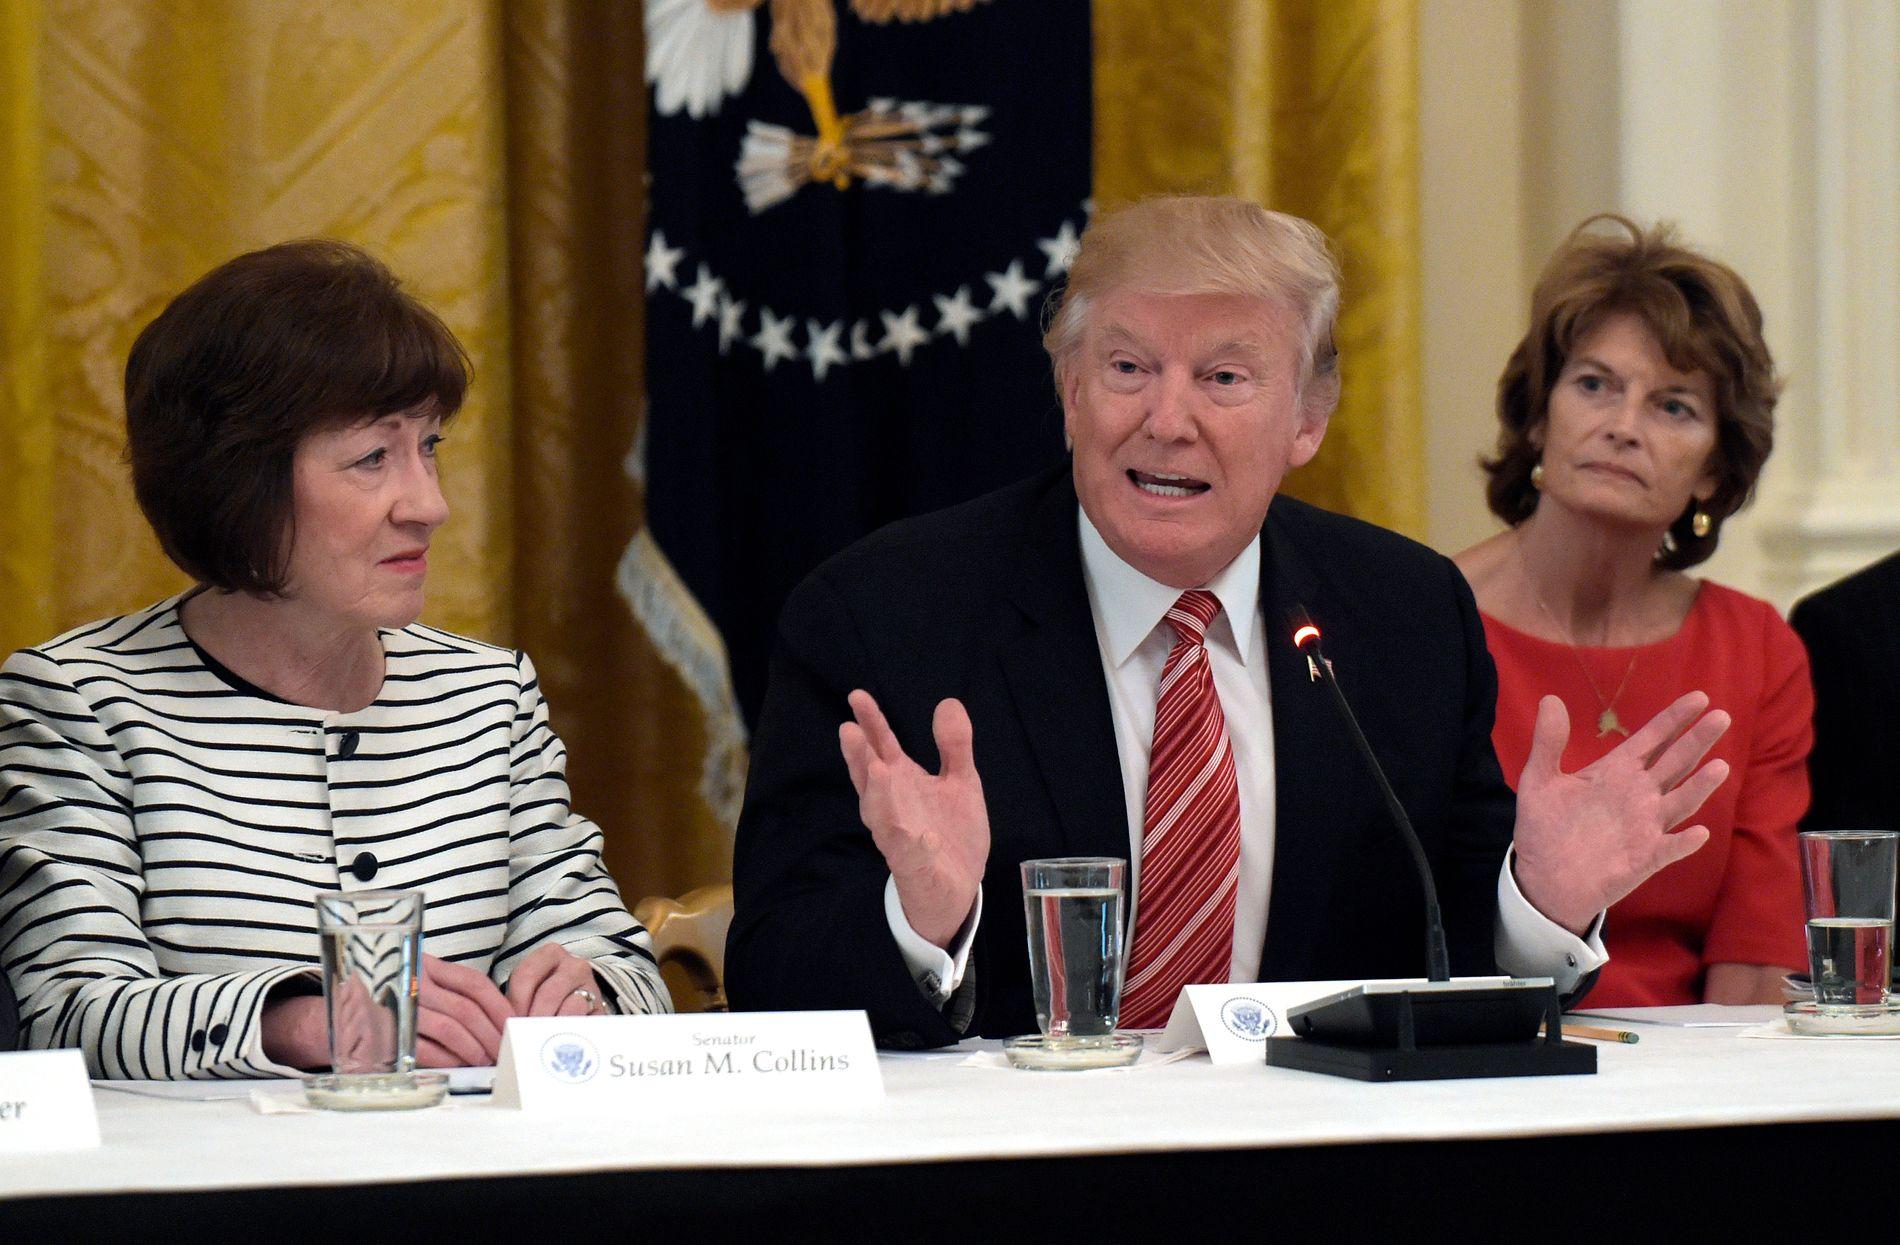 STEMTE MOT: Både Susan Collins og Lisa Murkowski stemte mot president Donald Trumps nye helsereform tirsdag.